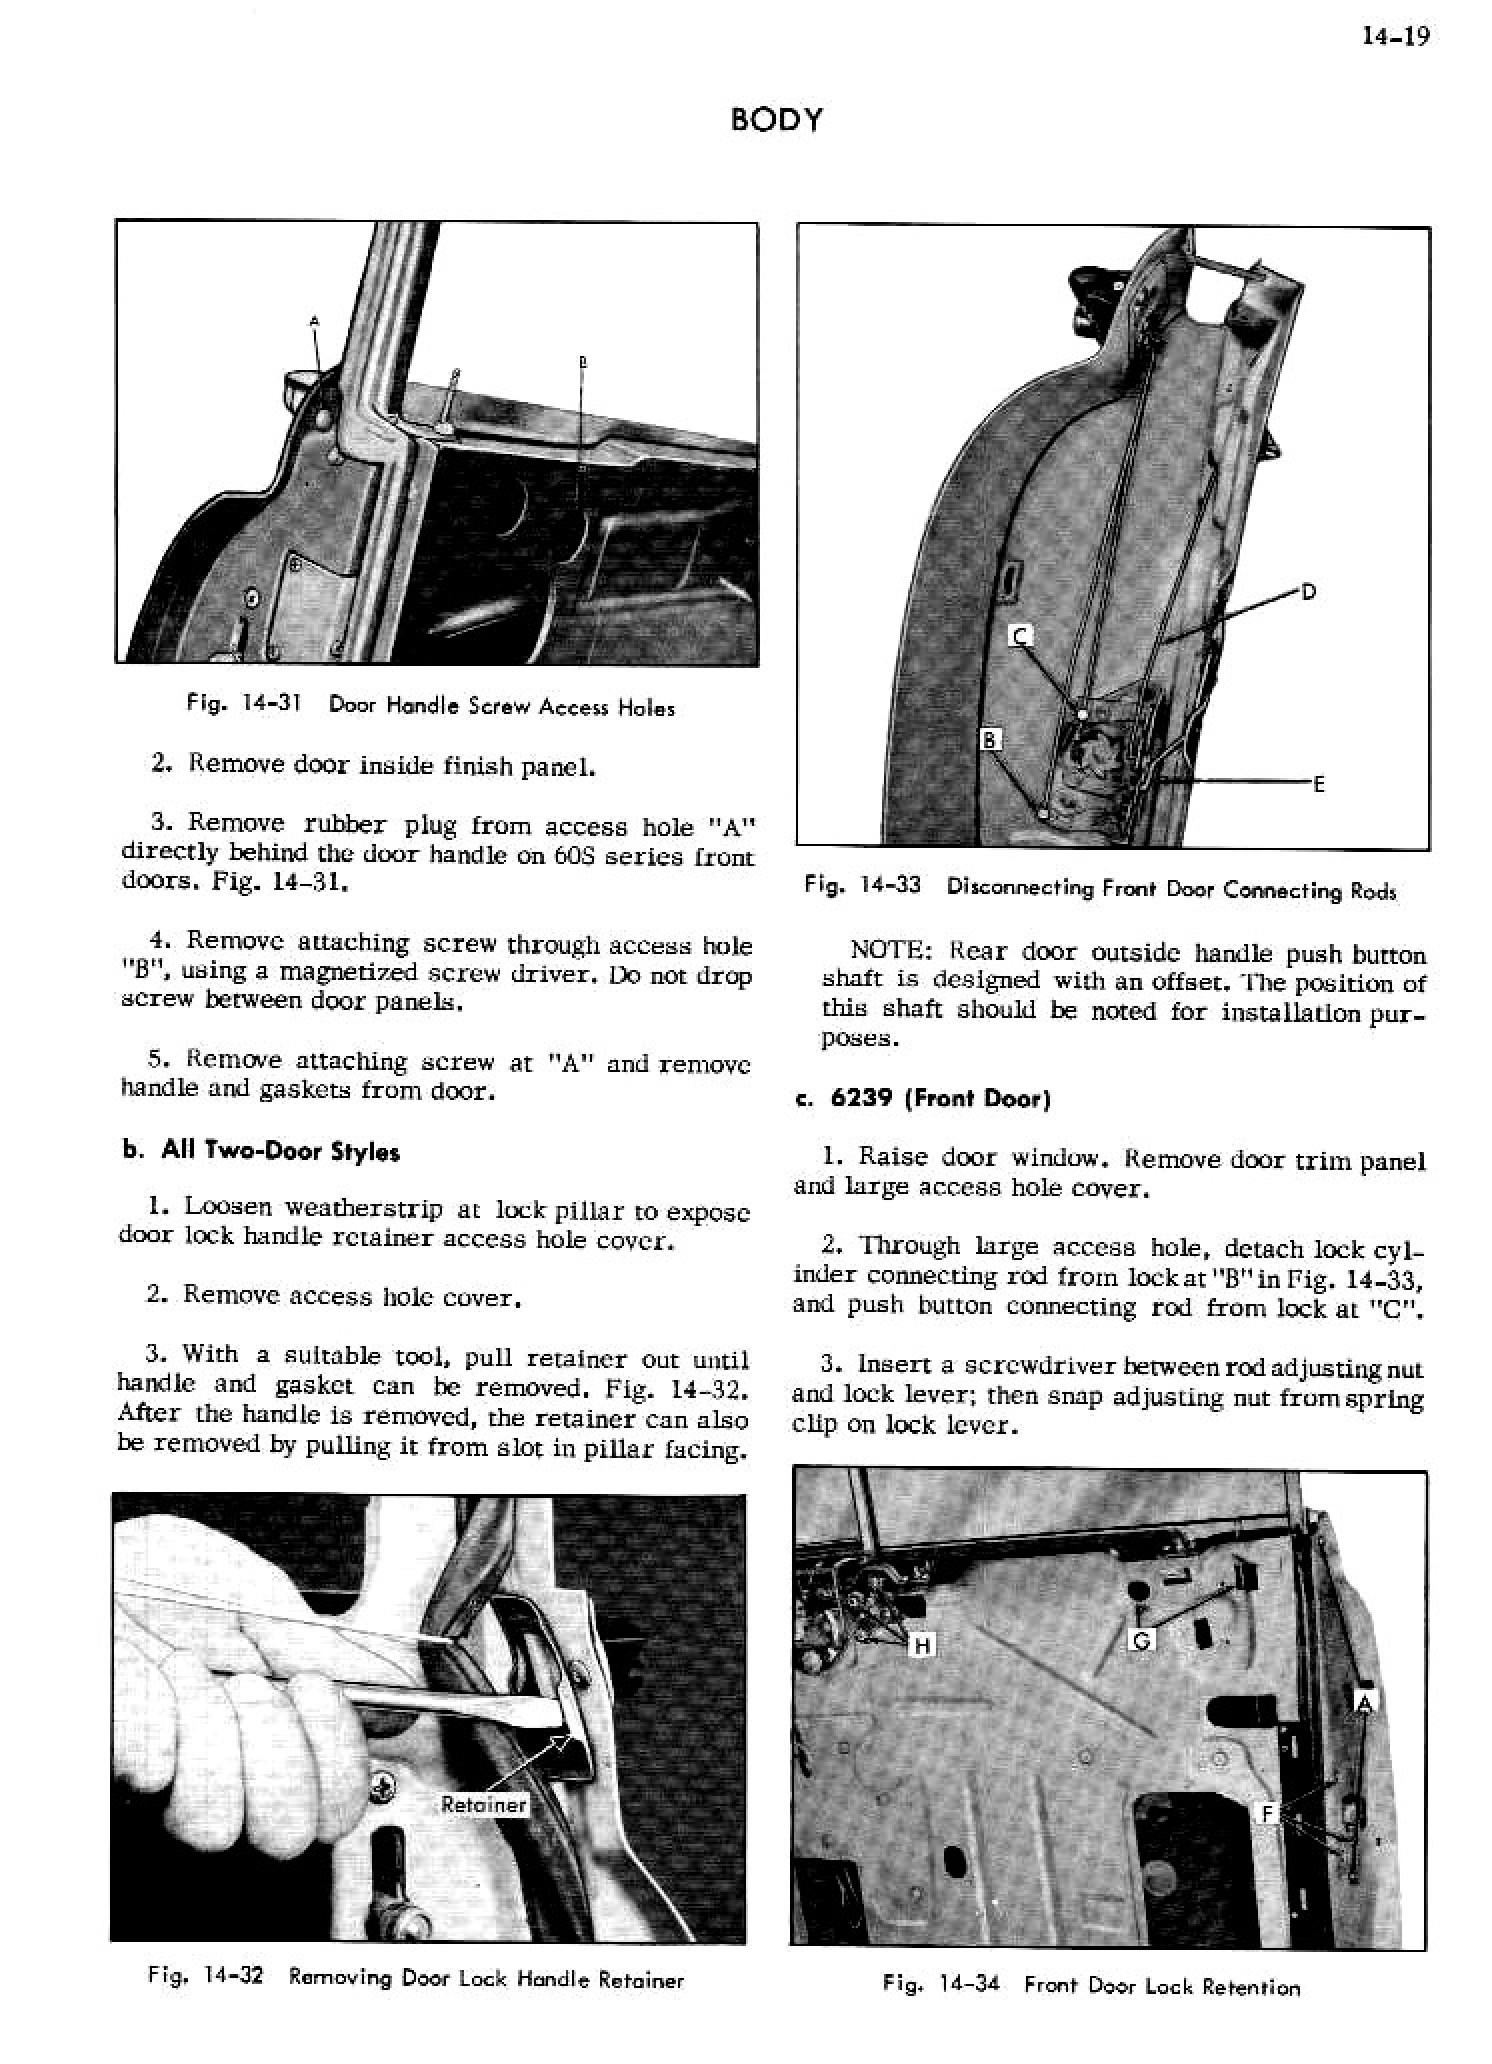 1956 Cadillac Shop Manual- Body Page 19 of 87